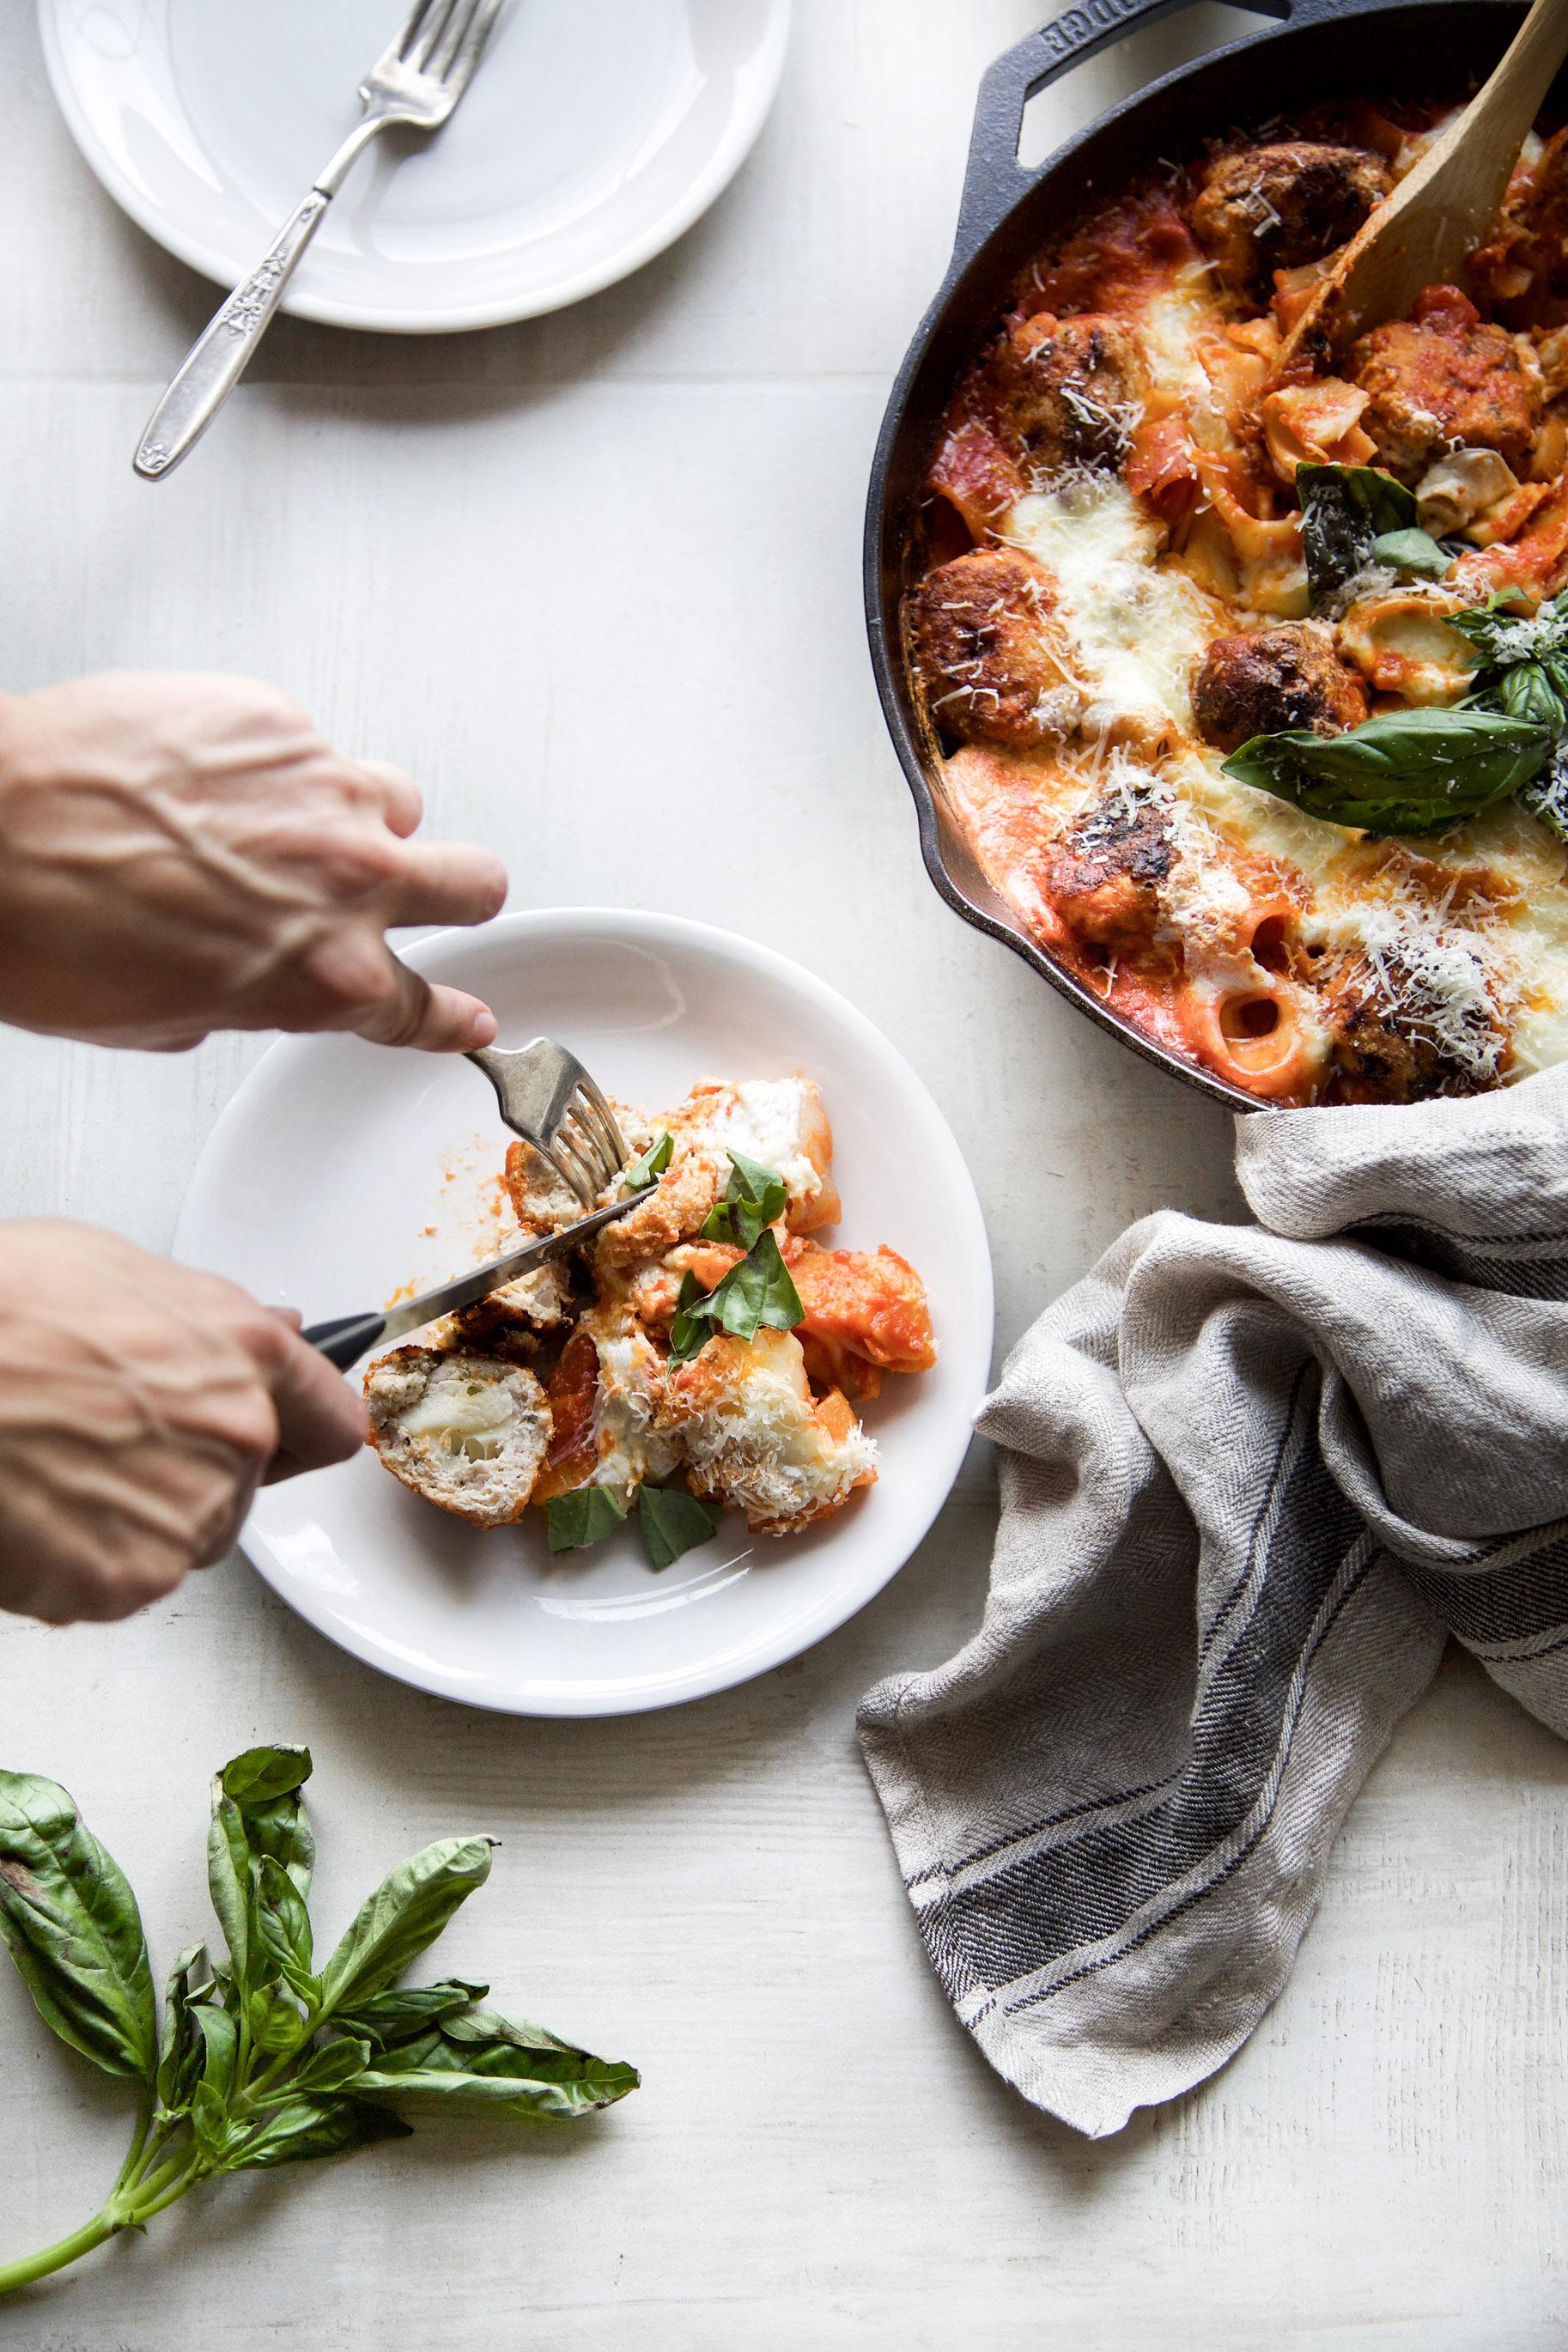 One-Pan-Chicken-Parm-Meatball-Burrata-Pasta-Bake8.jpg